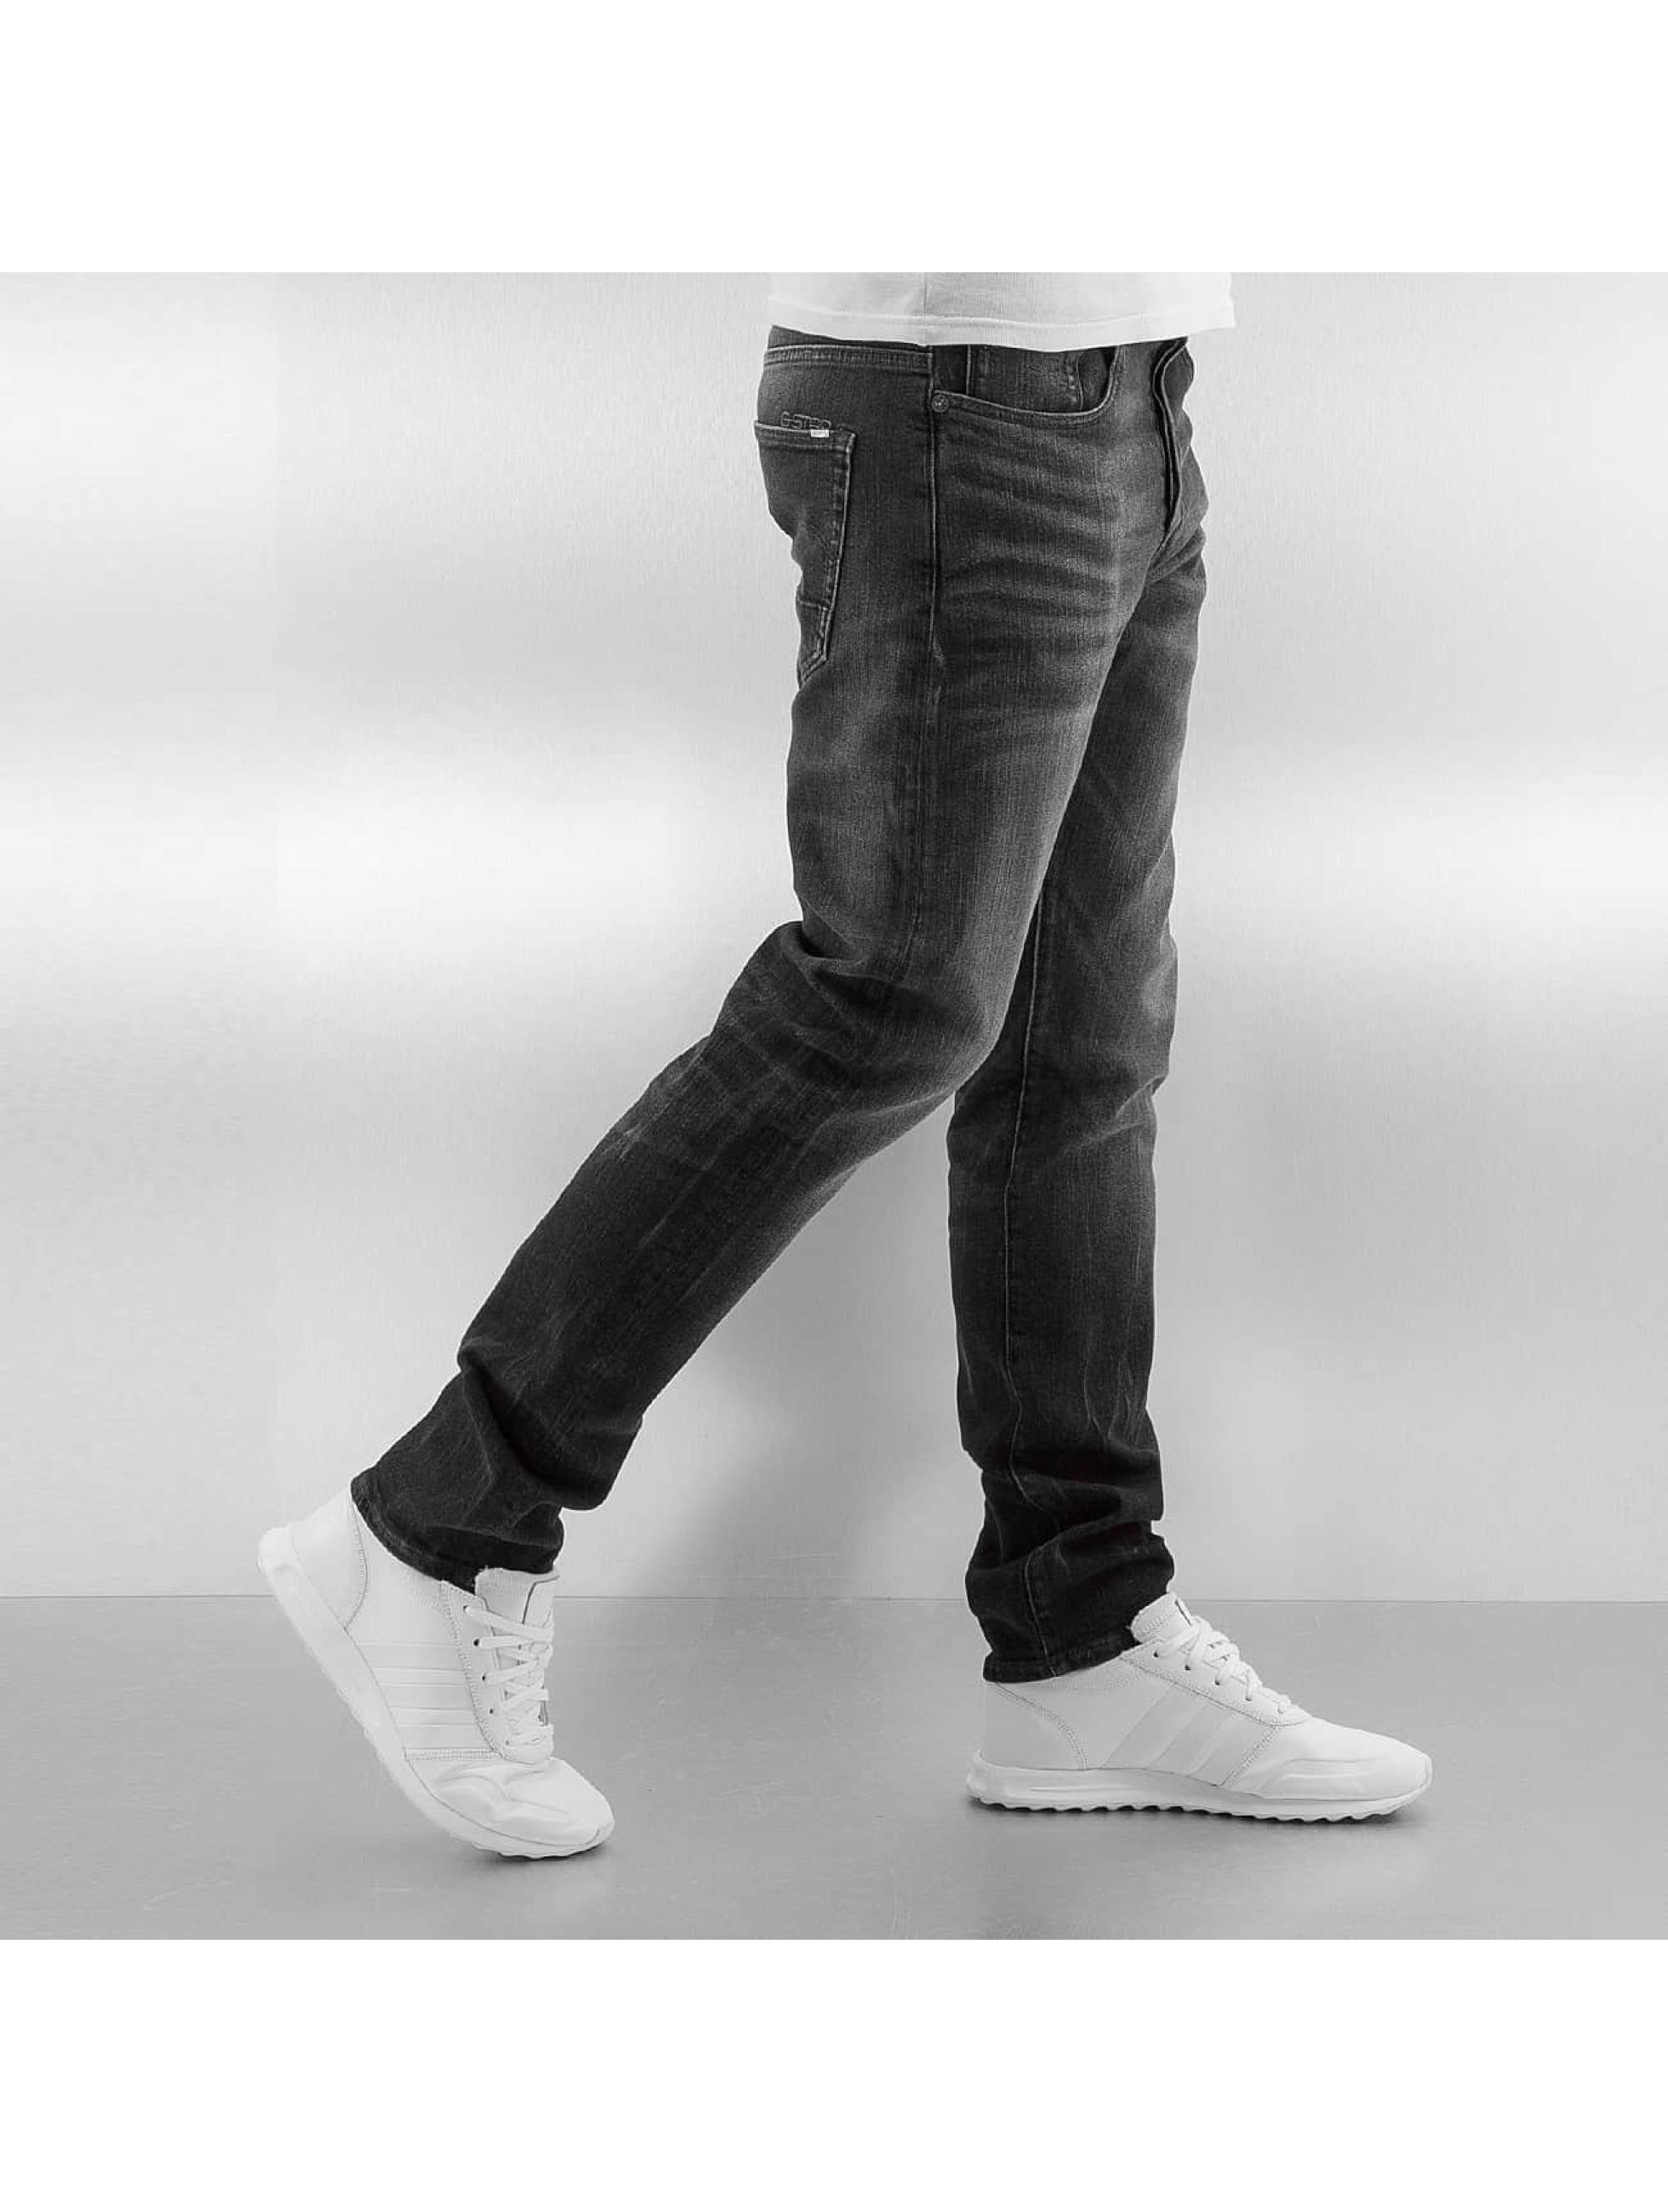 G-Star Skinny Jeans 3301 Slim Skop Black Strech Denim grau